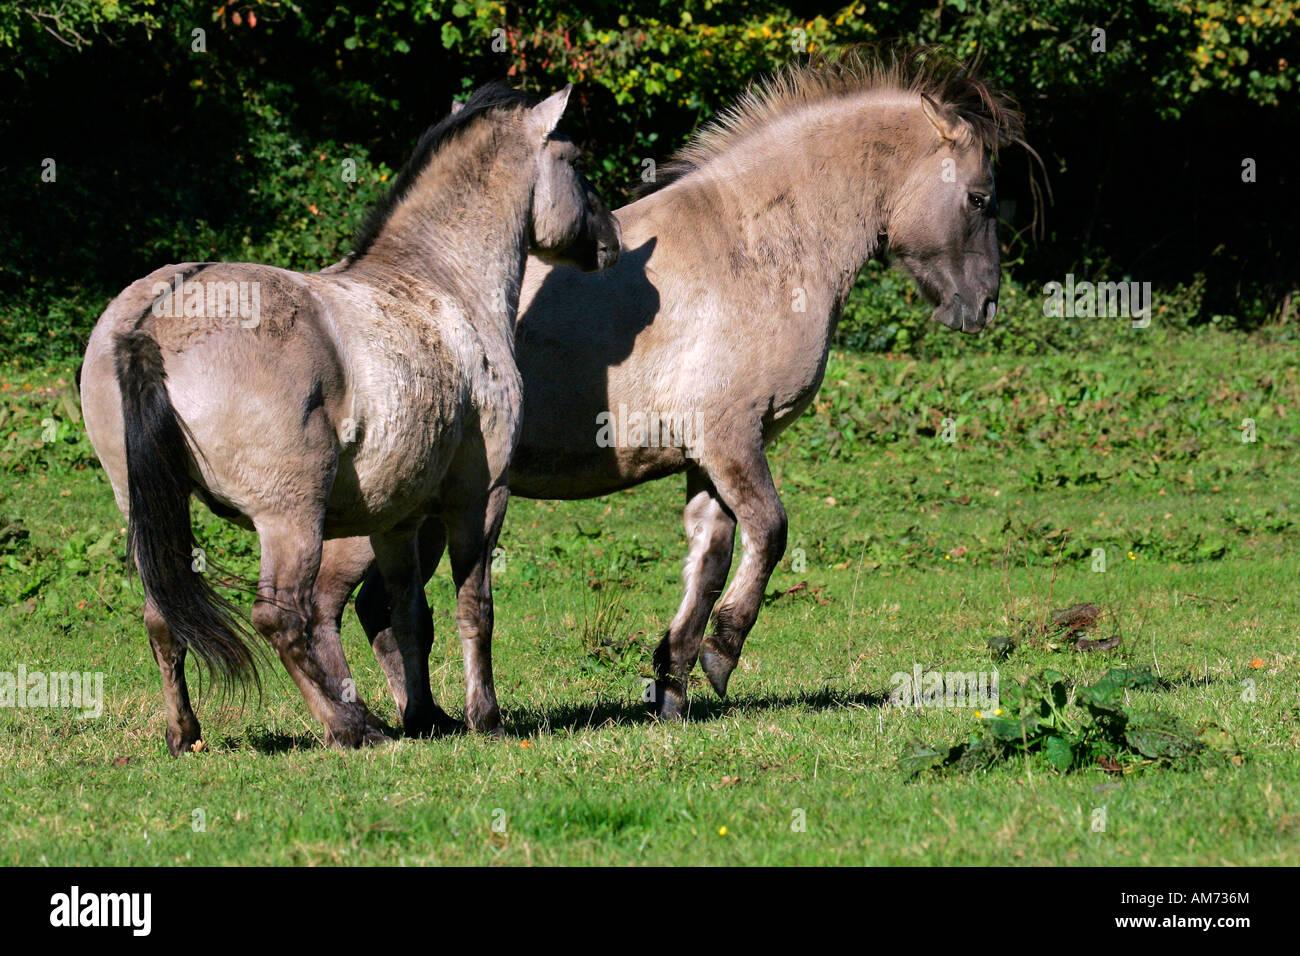 Konik horses - couple - social behaviour (Equus przewalskii f. caballus) Stock Photo